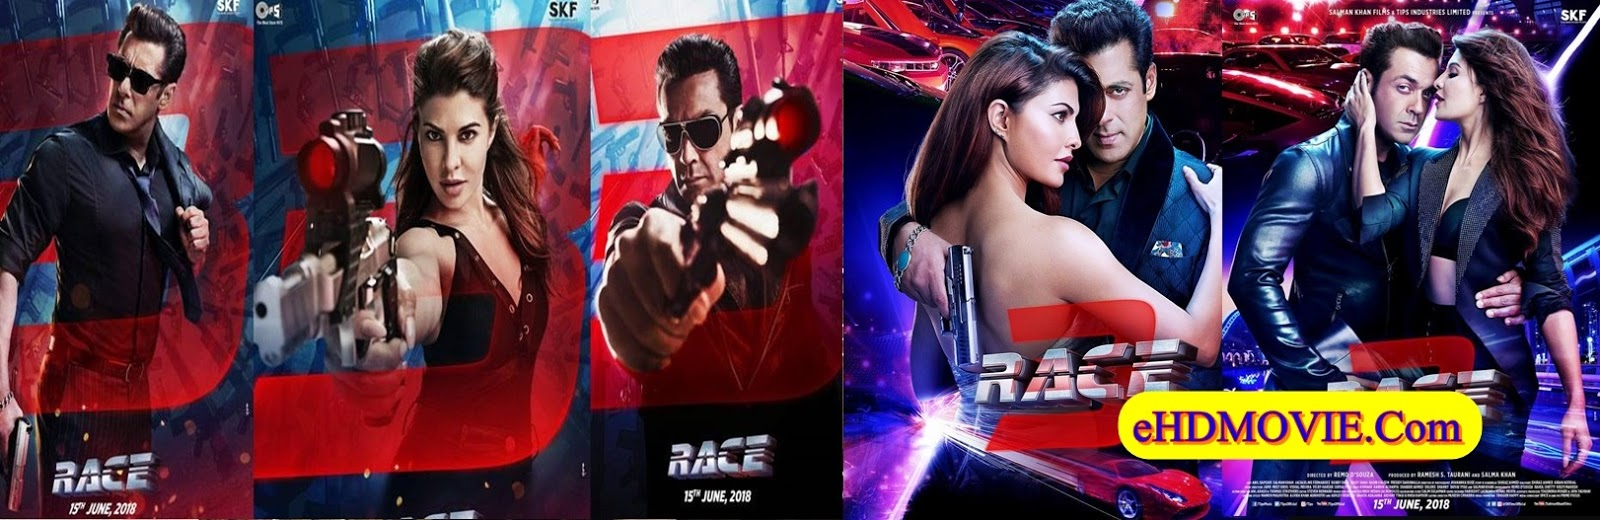 Race 3 2018 Full Movie Hindi 1080p - 720p - HEVC - 480p ORG HDRip 450MB - 700MB - 1.5GB - 3.6GB ESubs Free Download